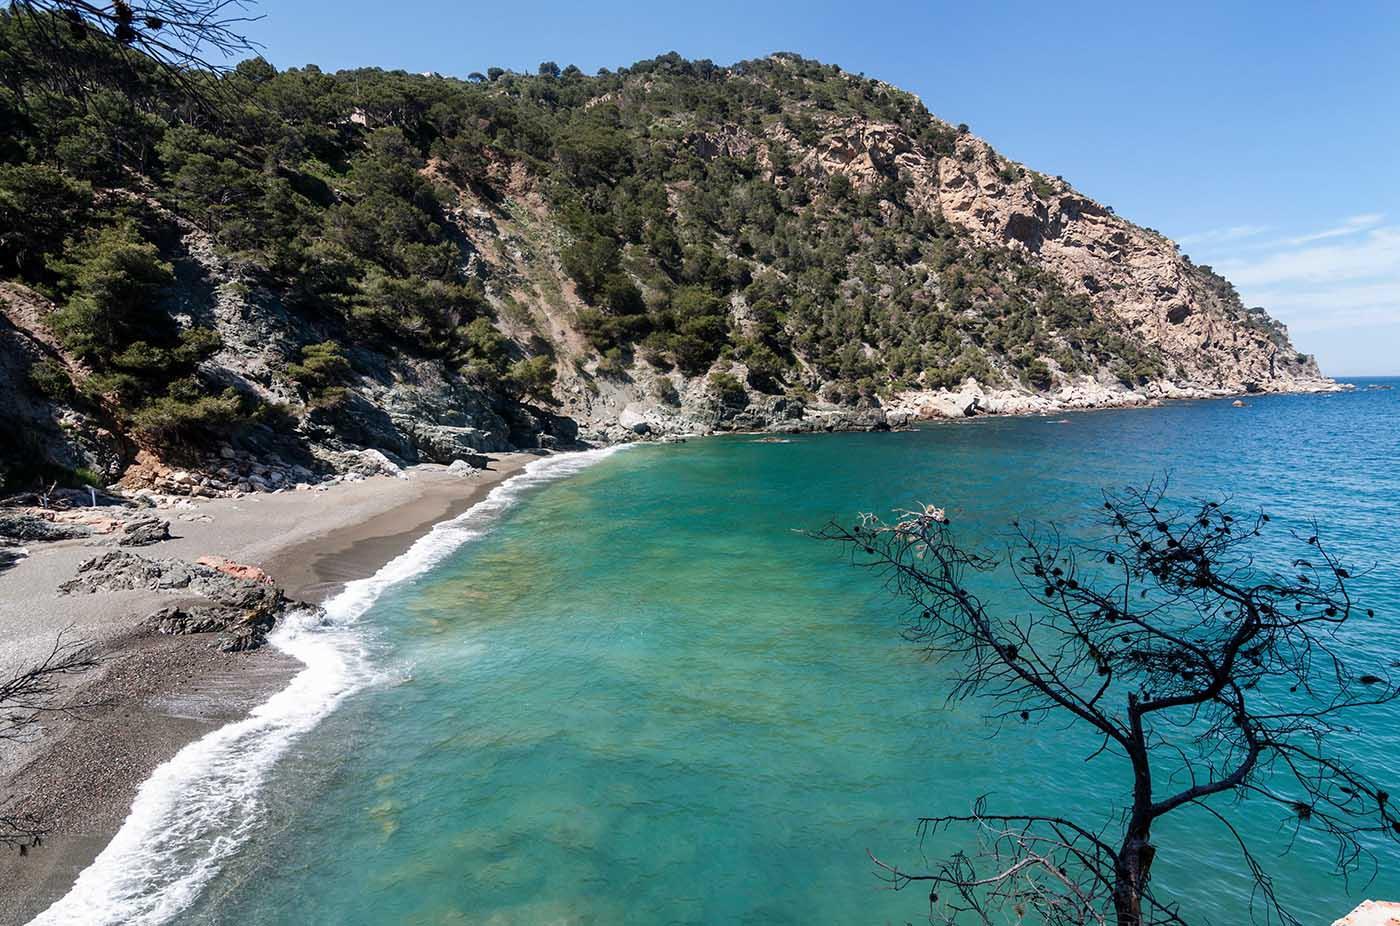 Cala Fonda, Tarragona. Mejores playas Cataluña. Best beaches Catalonia